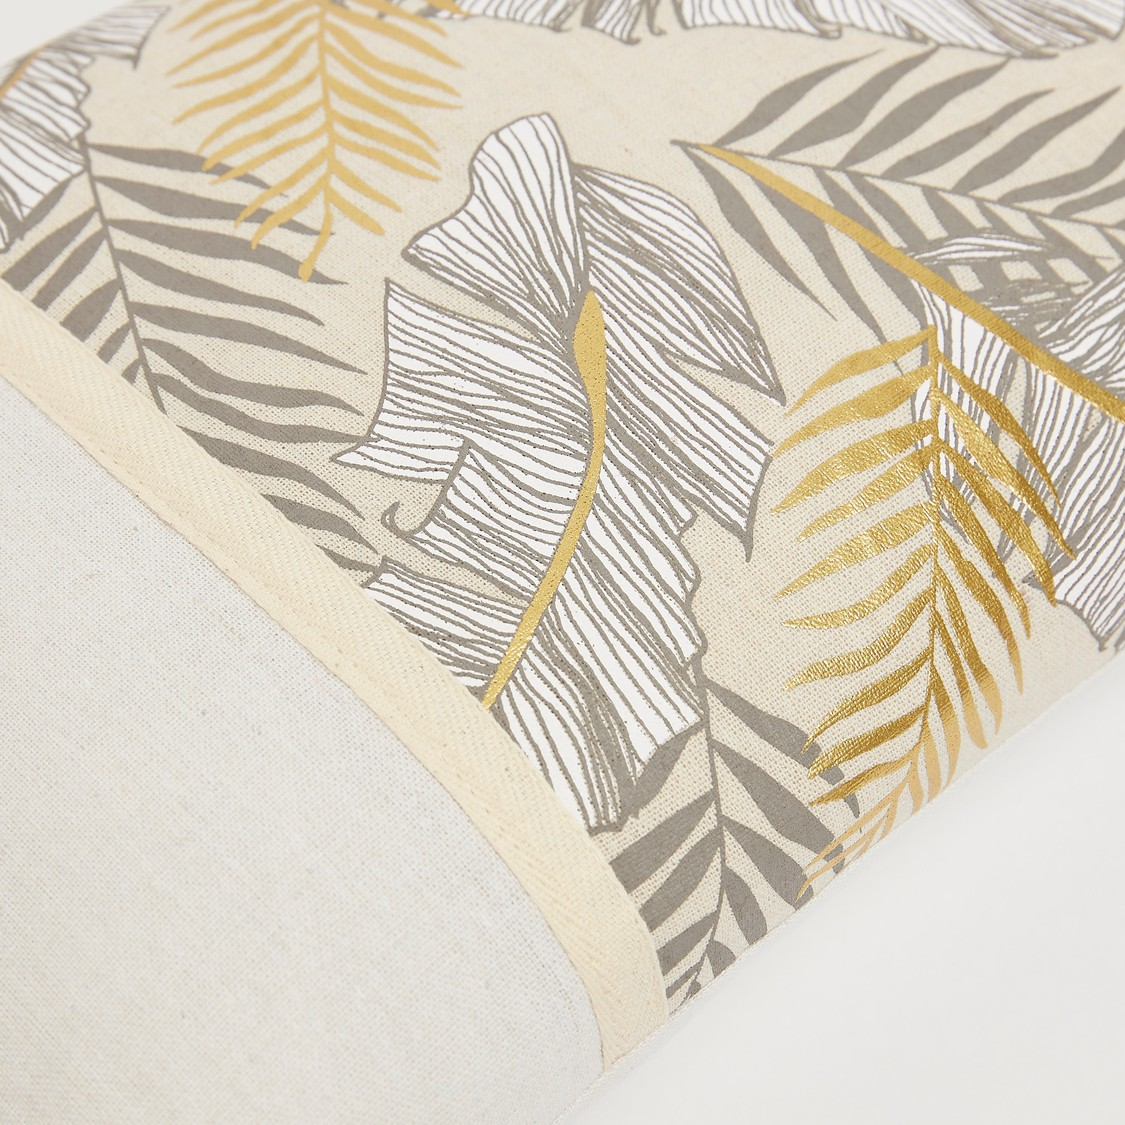 Printed Rectangular Filled Cushion - 50x30 cms